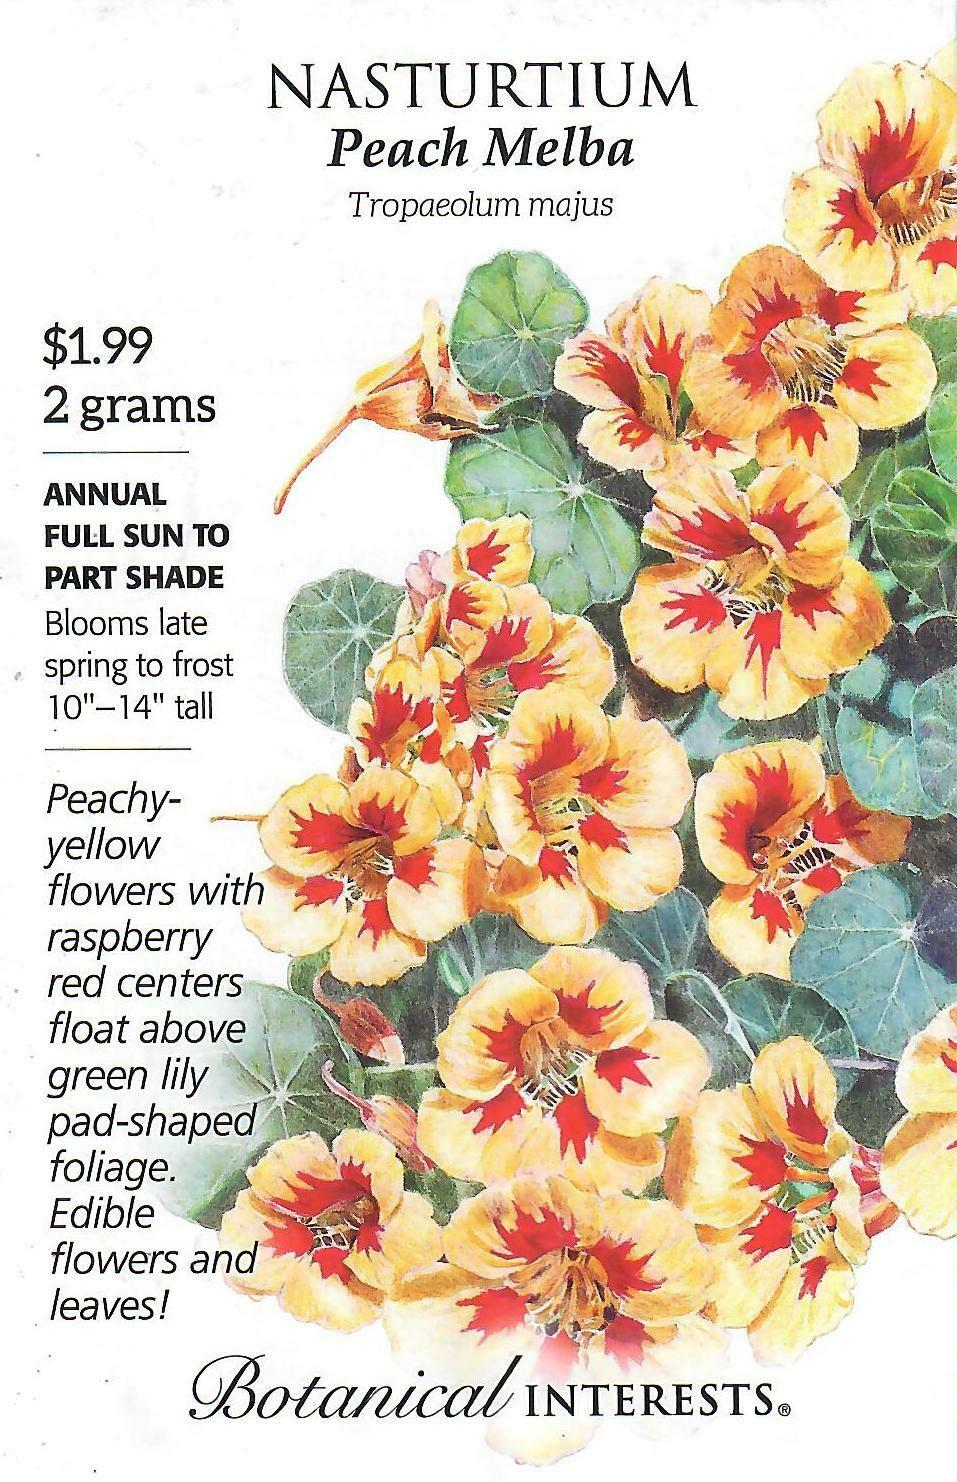 Nasturtium Peach Melba Botanical Interests